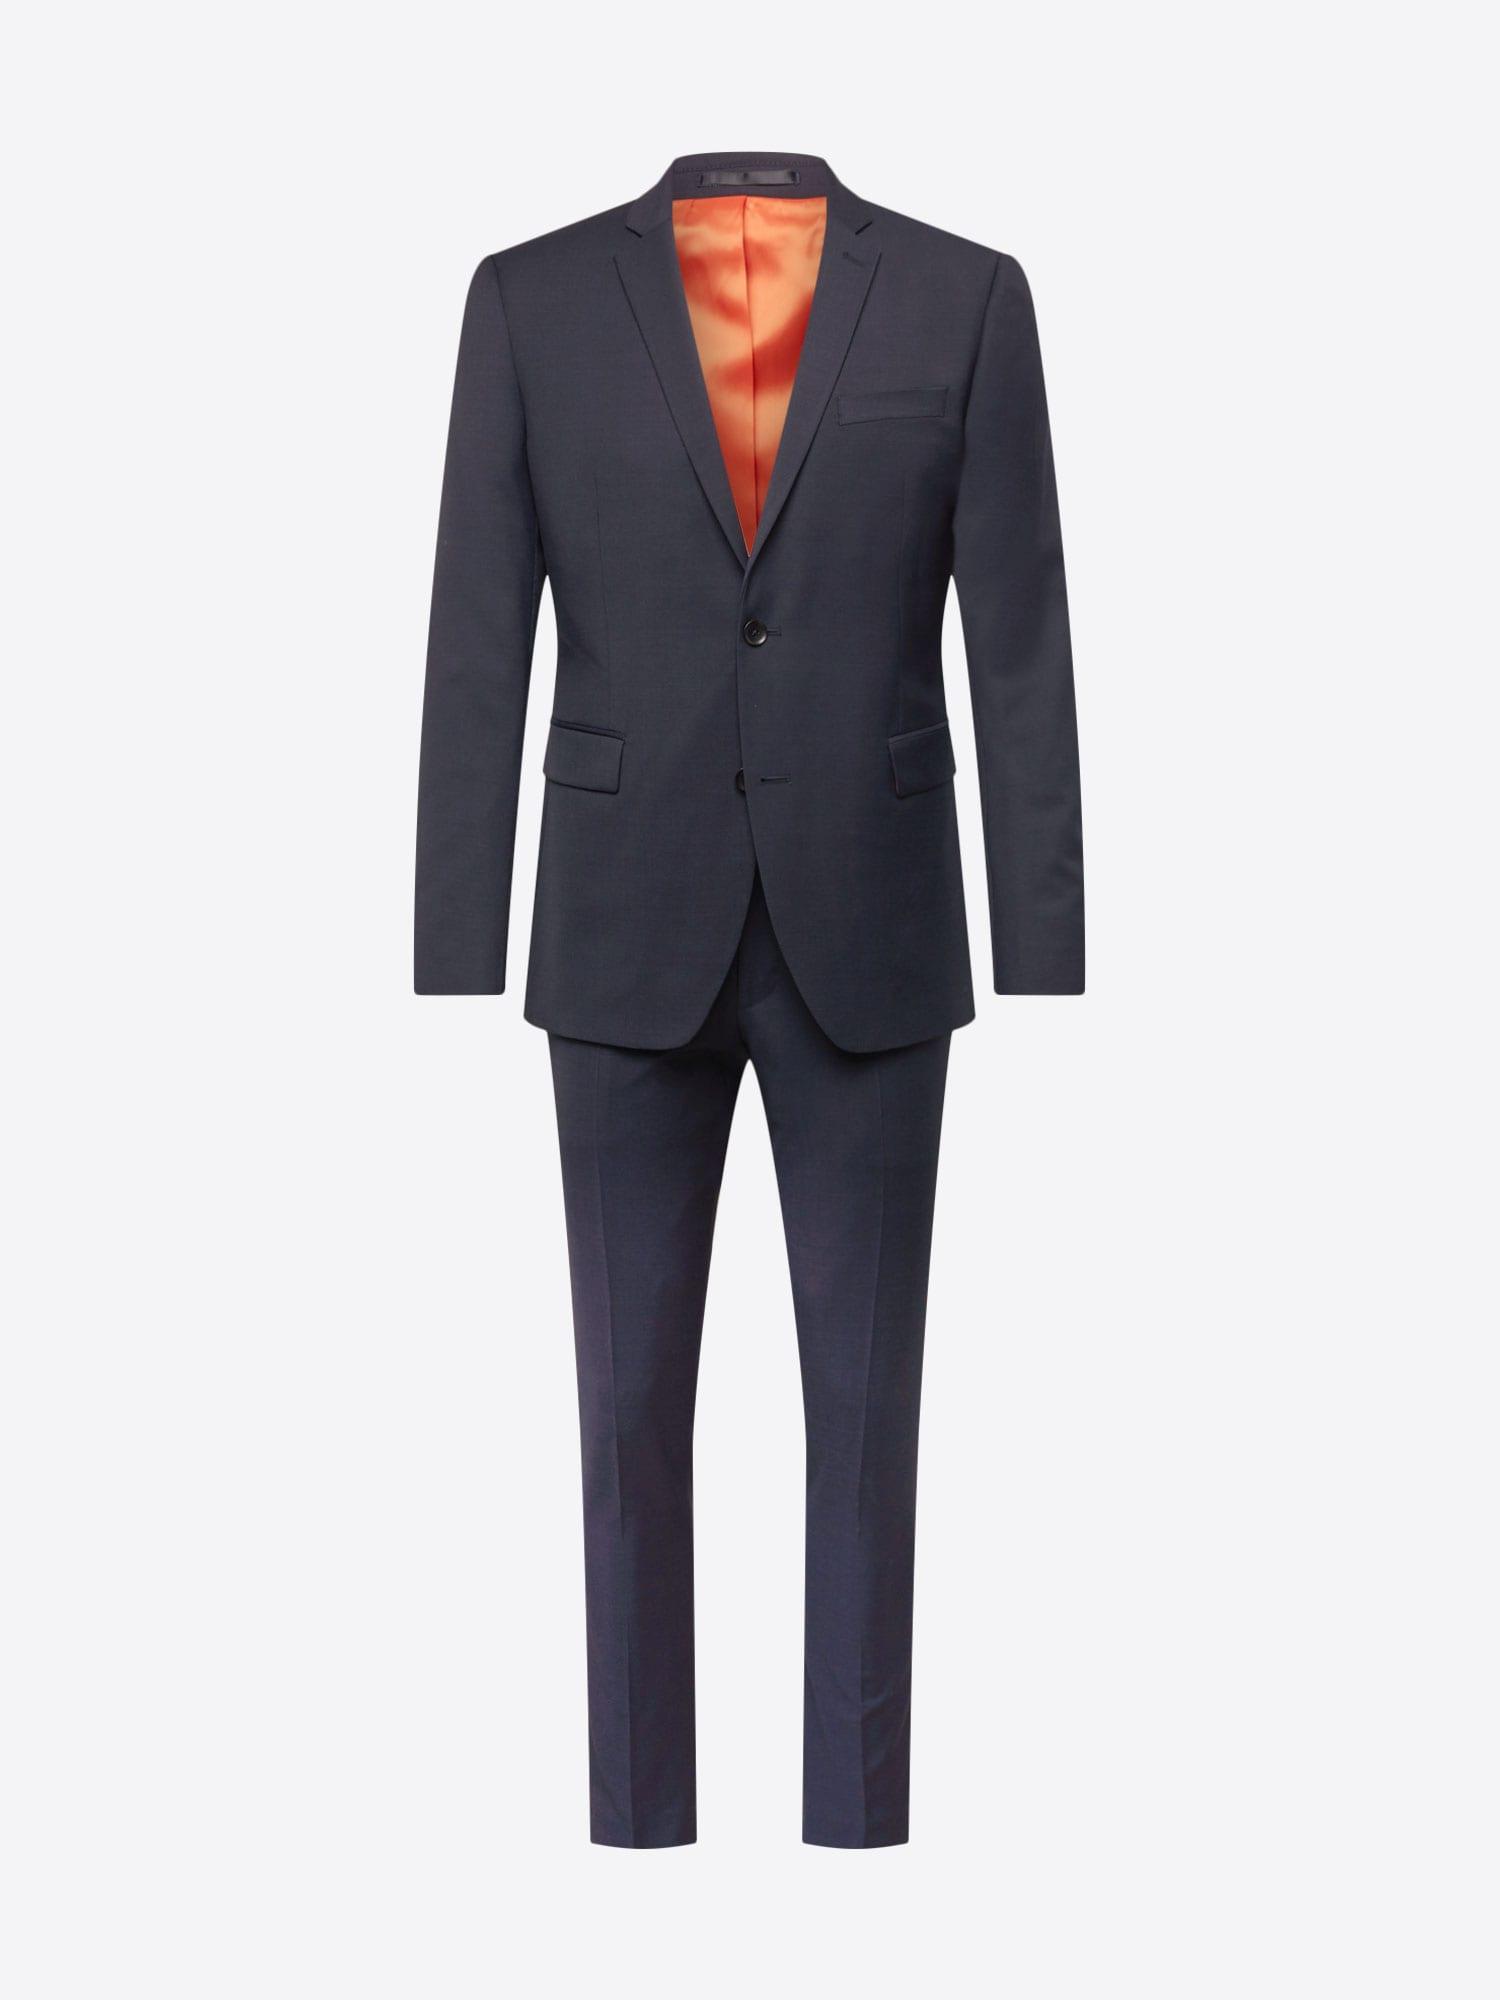 Esprit Collection, Herren Pak Student Special, kobaltblauw